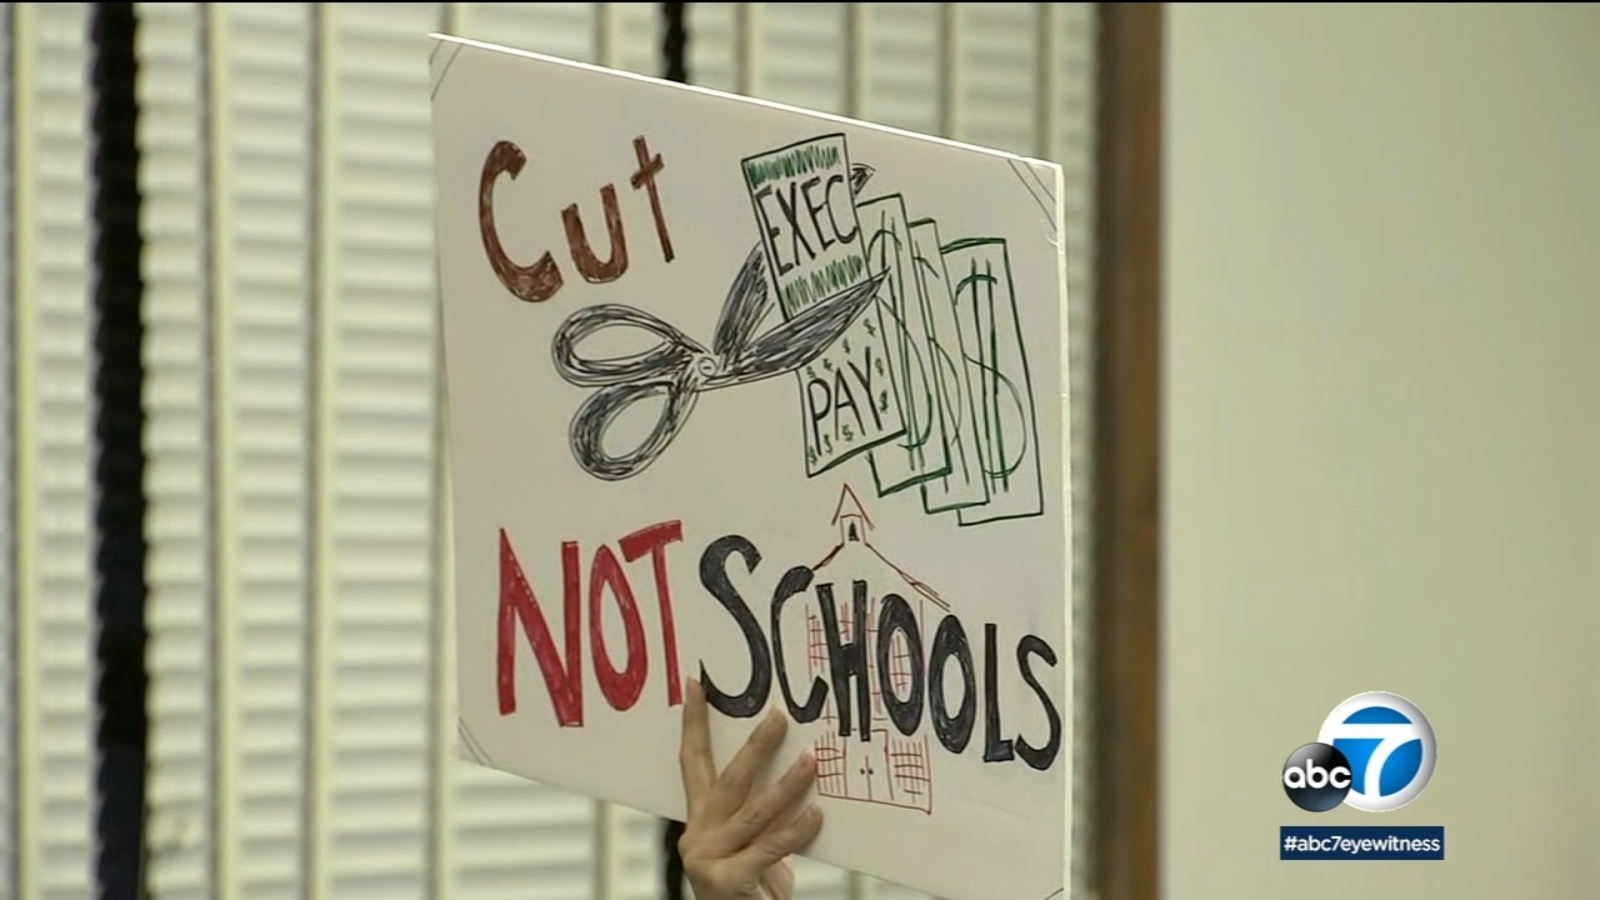 School Board Votes To Close 3 Pasadena Unified School District Schools Amid Shrinking Enrollment Financial Difficulties Abc7 Los Angeles